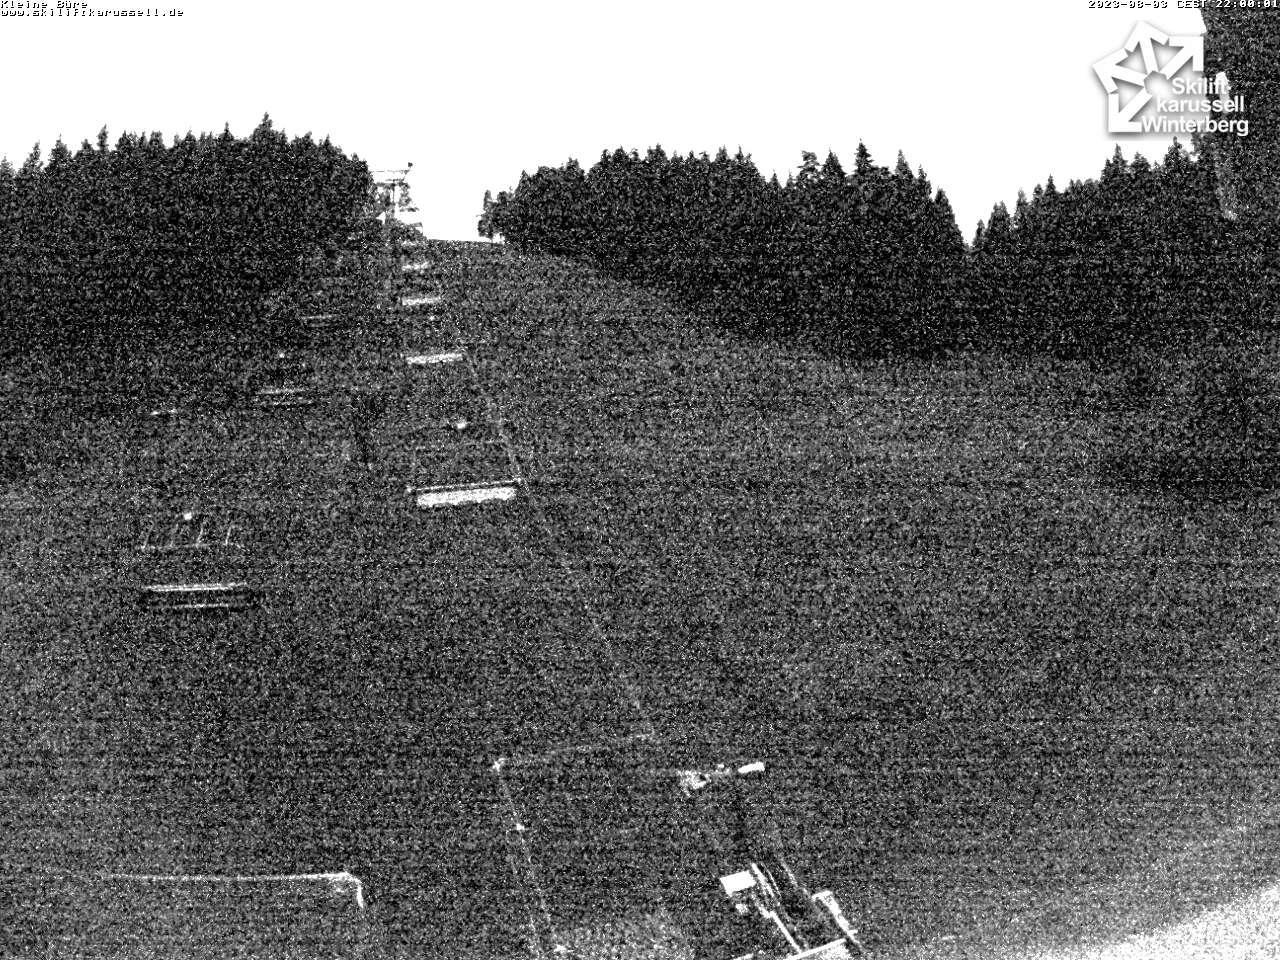 Webcam Winterberg - Kleine Büre